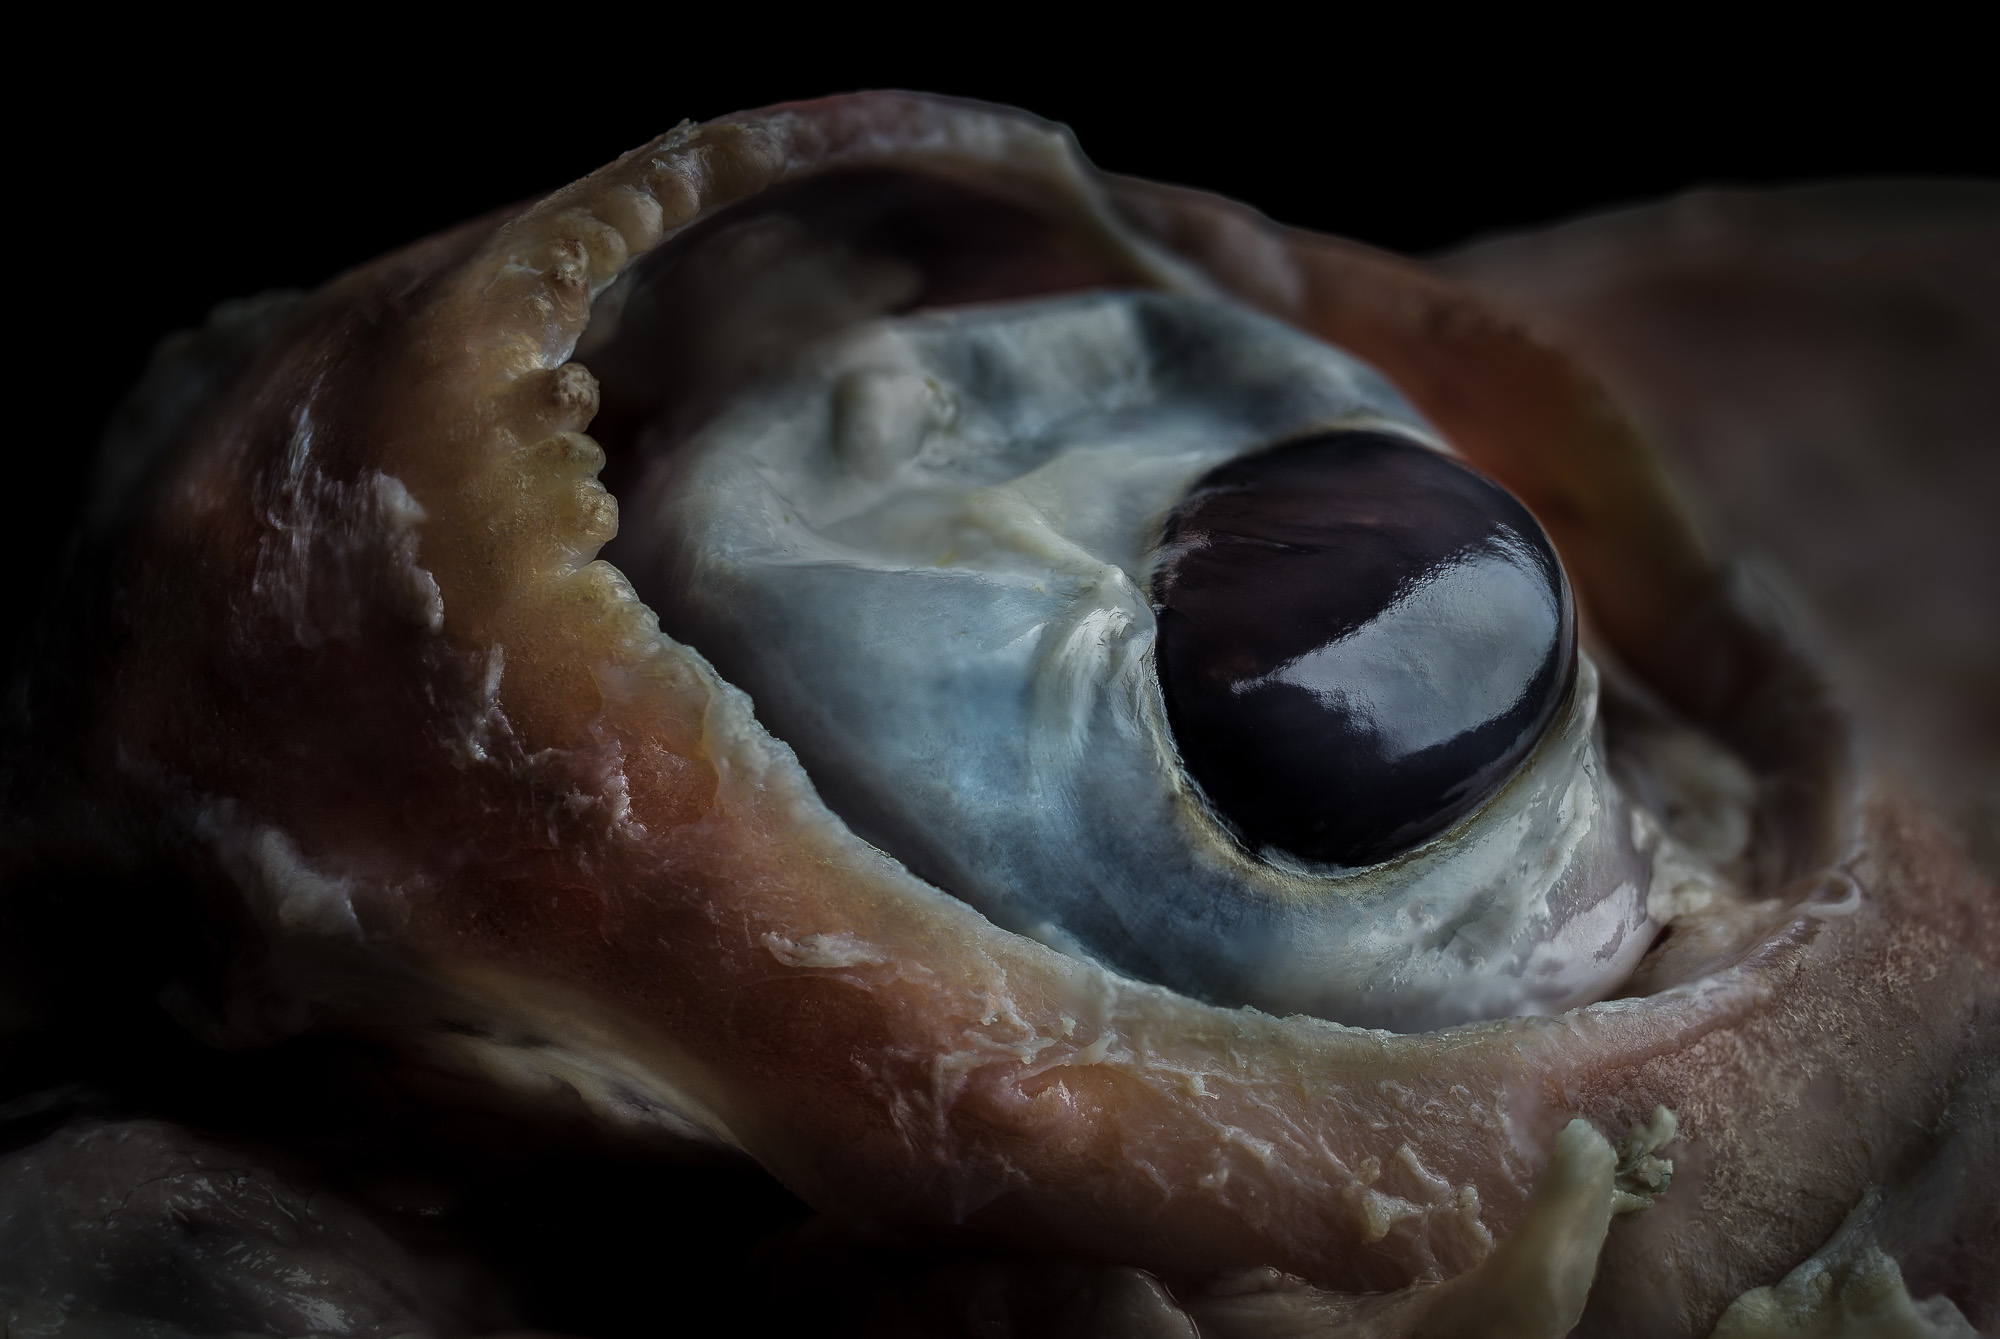 neal-auch-close-up-lamb-eye.jpg